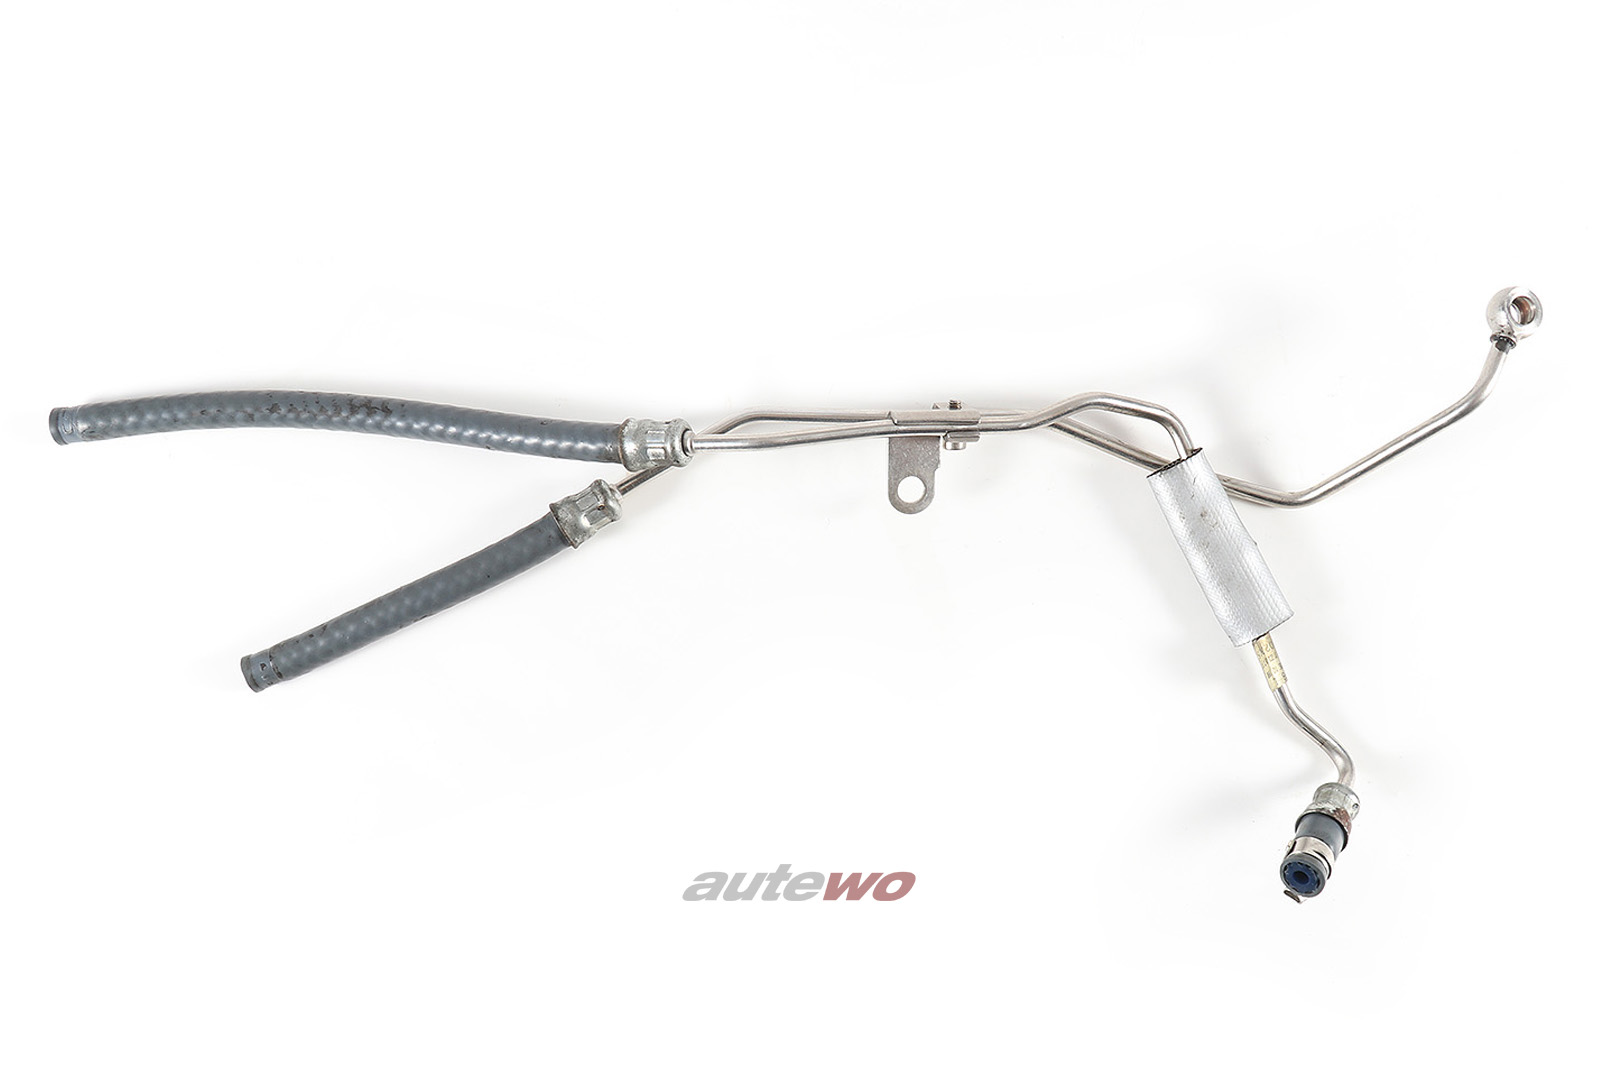 078145718L Audi S4/RS4 B5/A6 4B 2.7l Biturbo Überdrucksteuerleitung Rechts